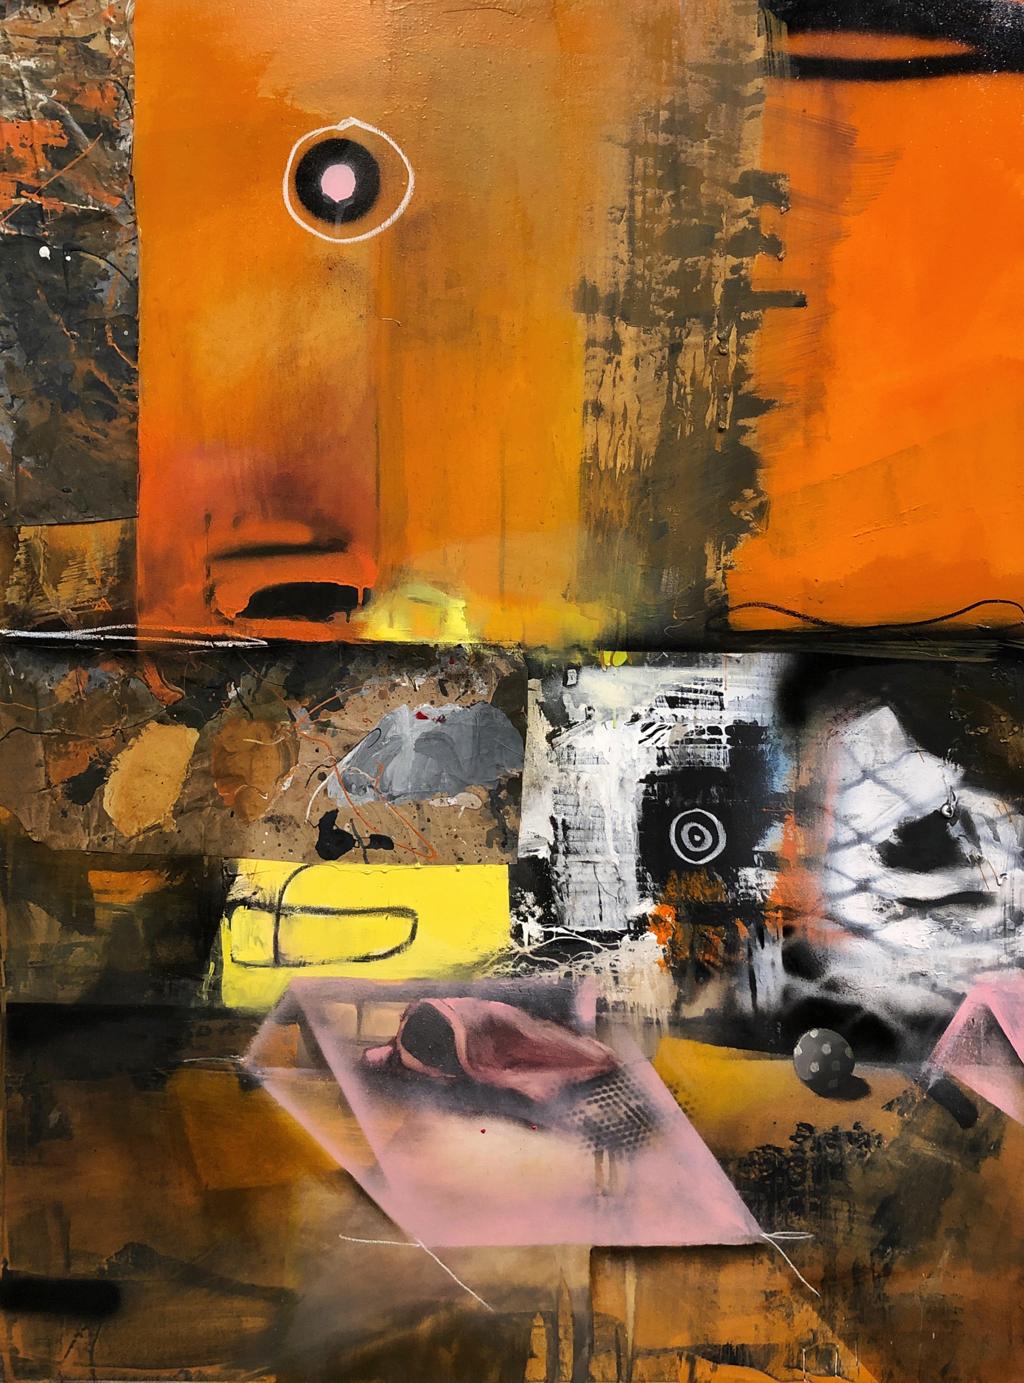 Tent City #5 by Marcus Jansen (b. 1968)